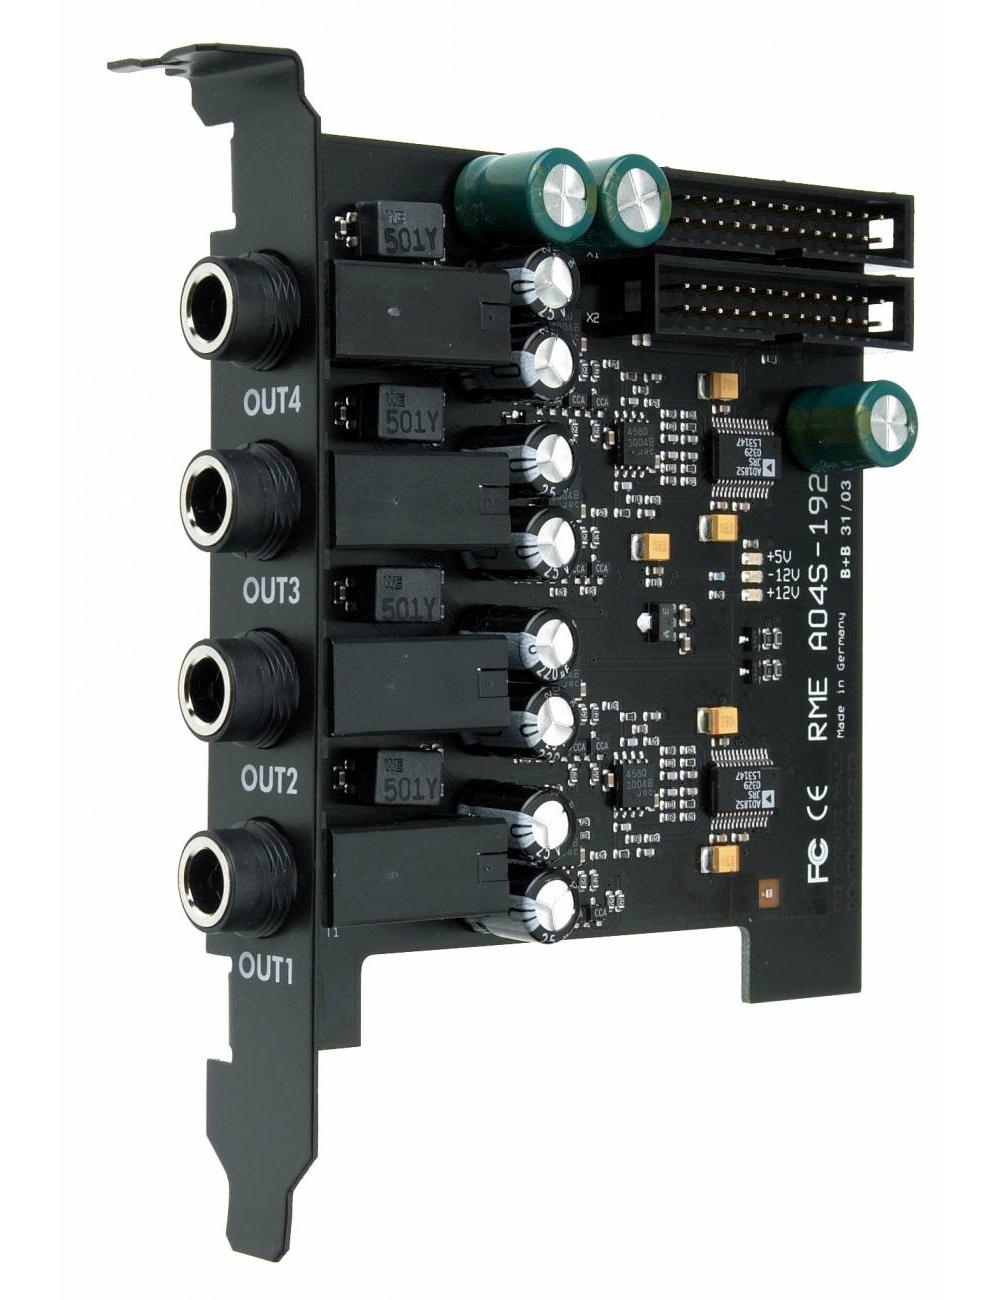 Звуковые карты RME AO4S-192 Expansion Board